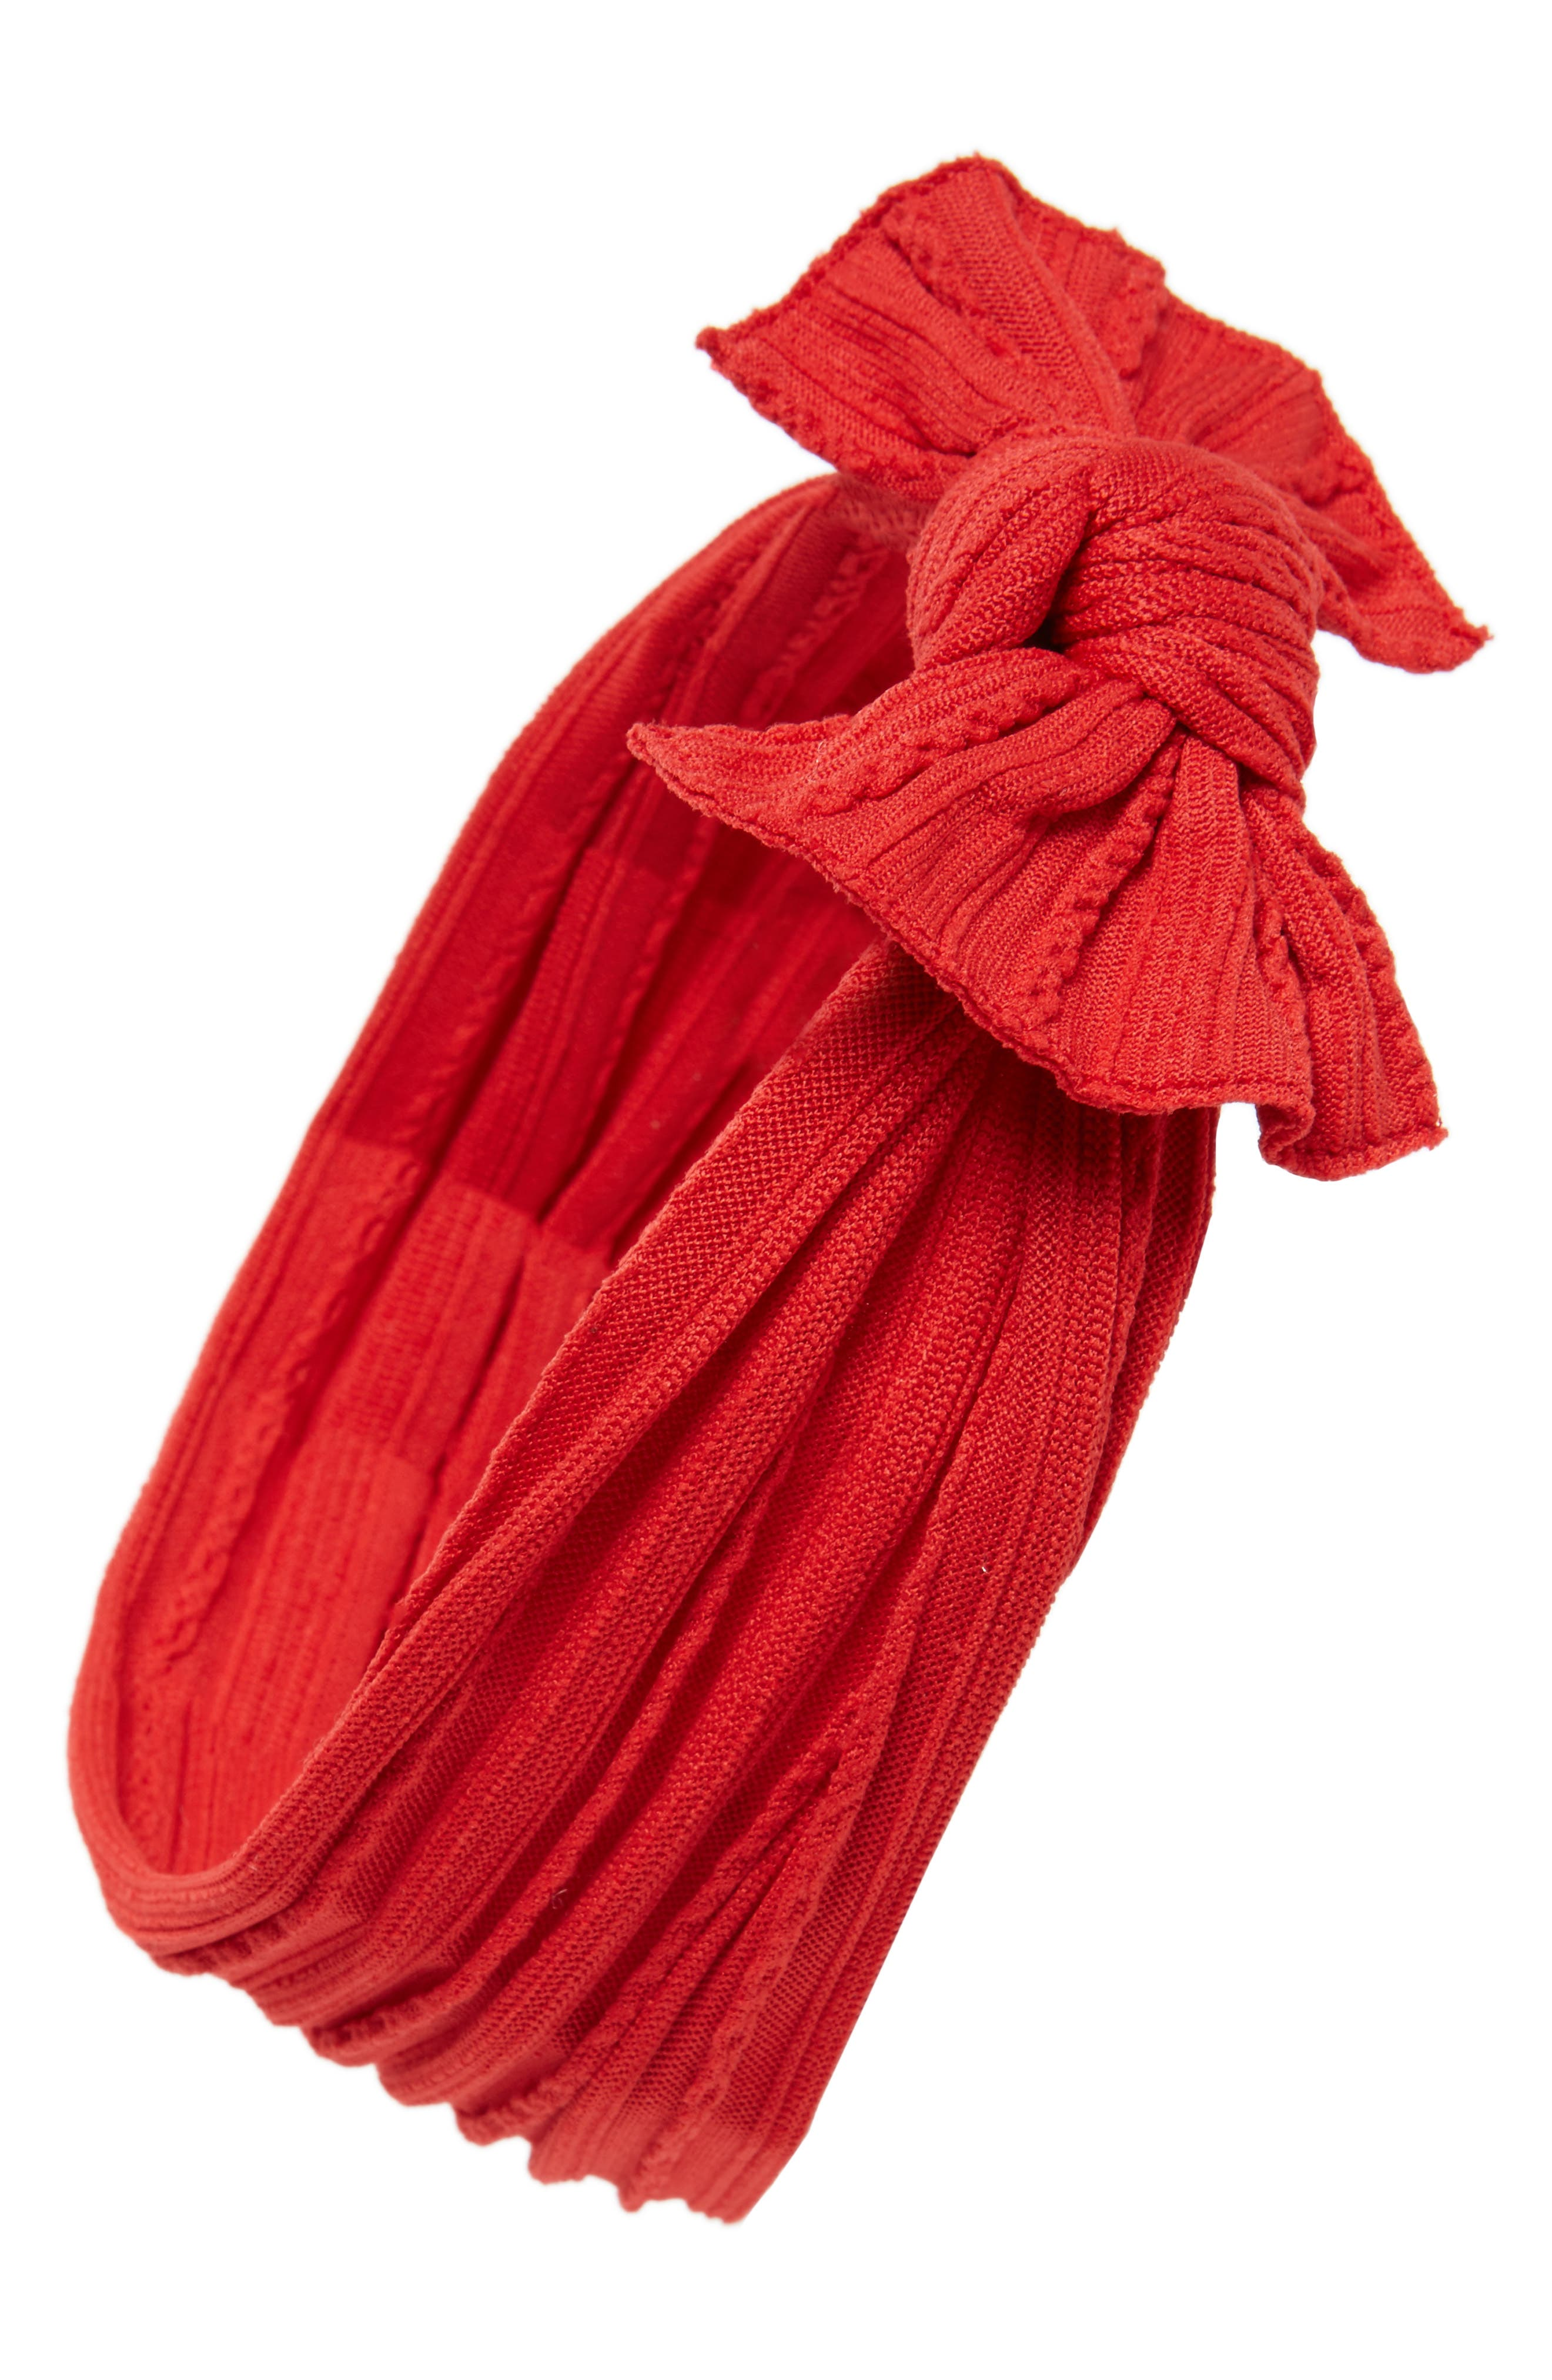 Cable Knot Headband,                             Main thumbnail 1, color,                             620